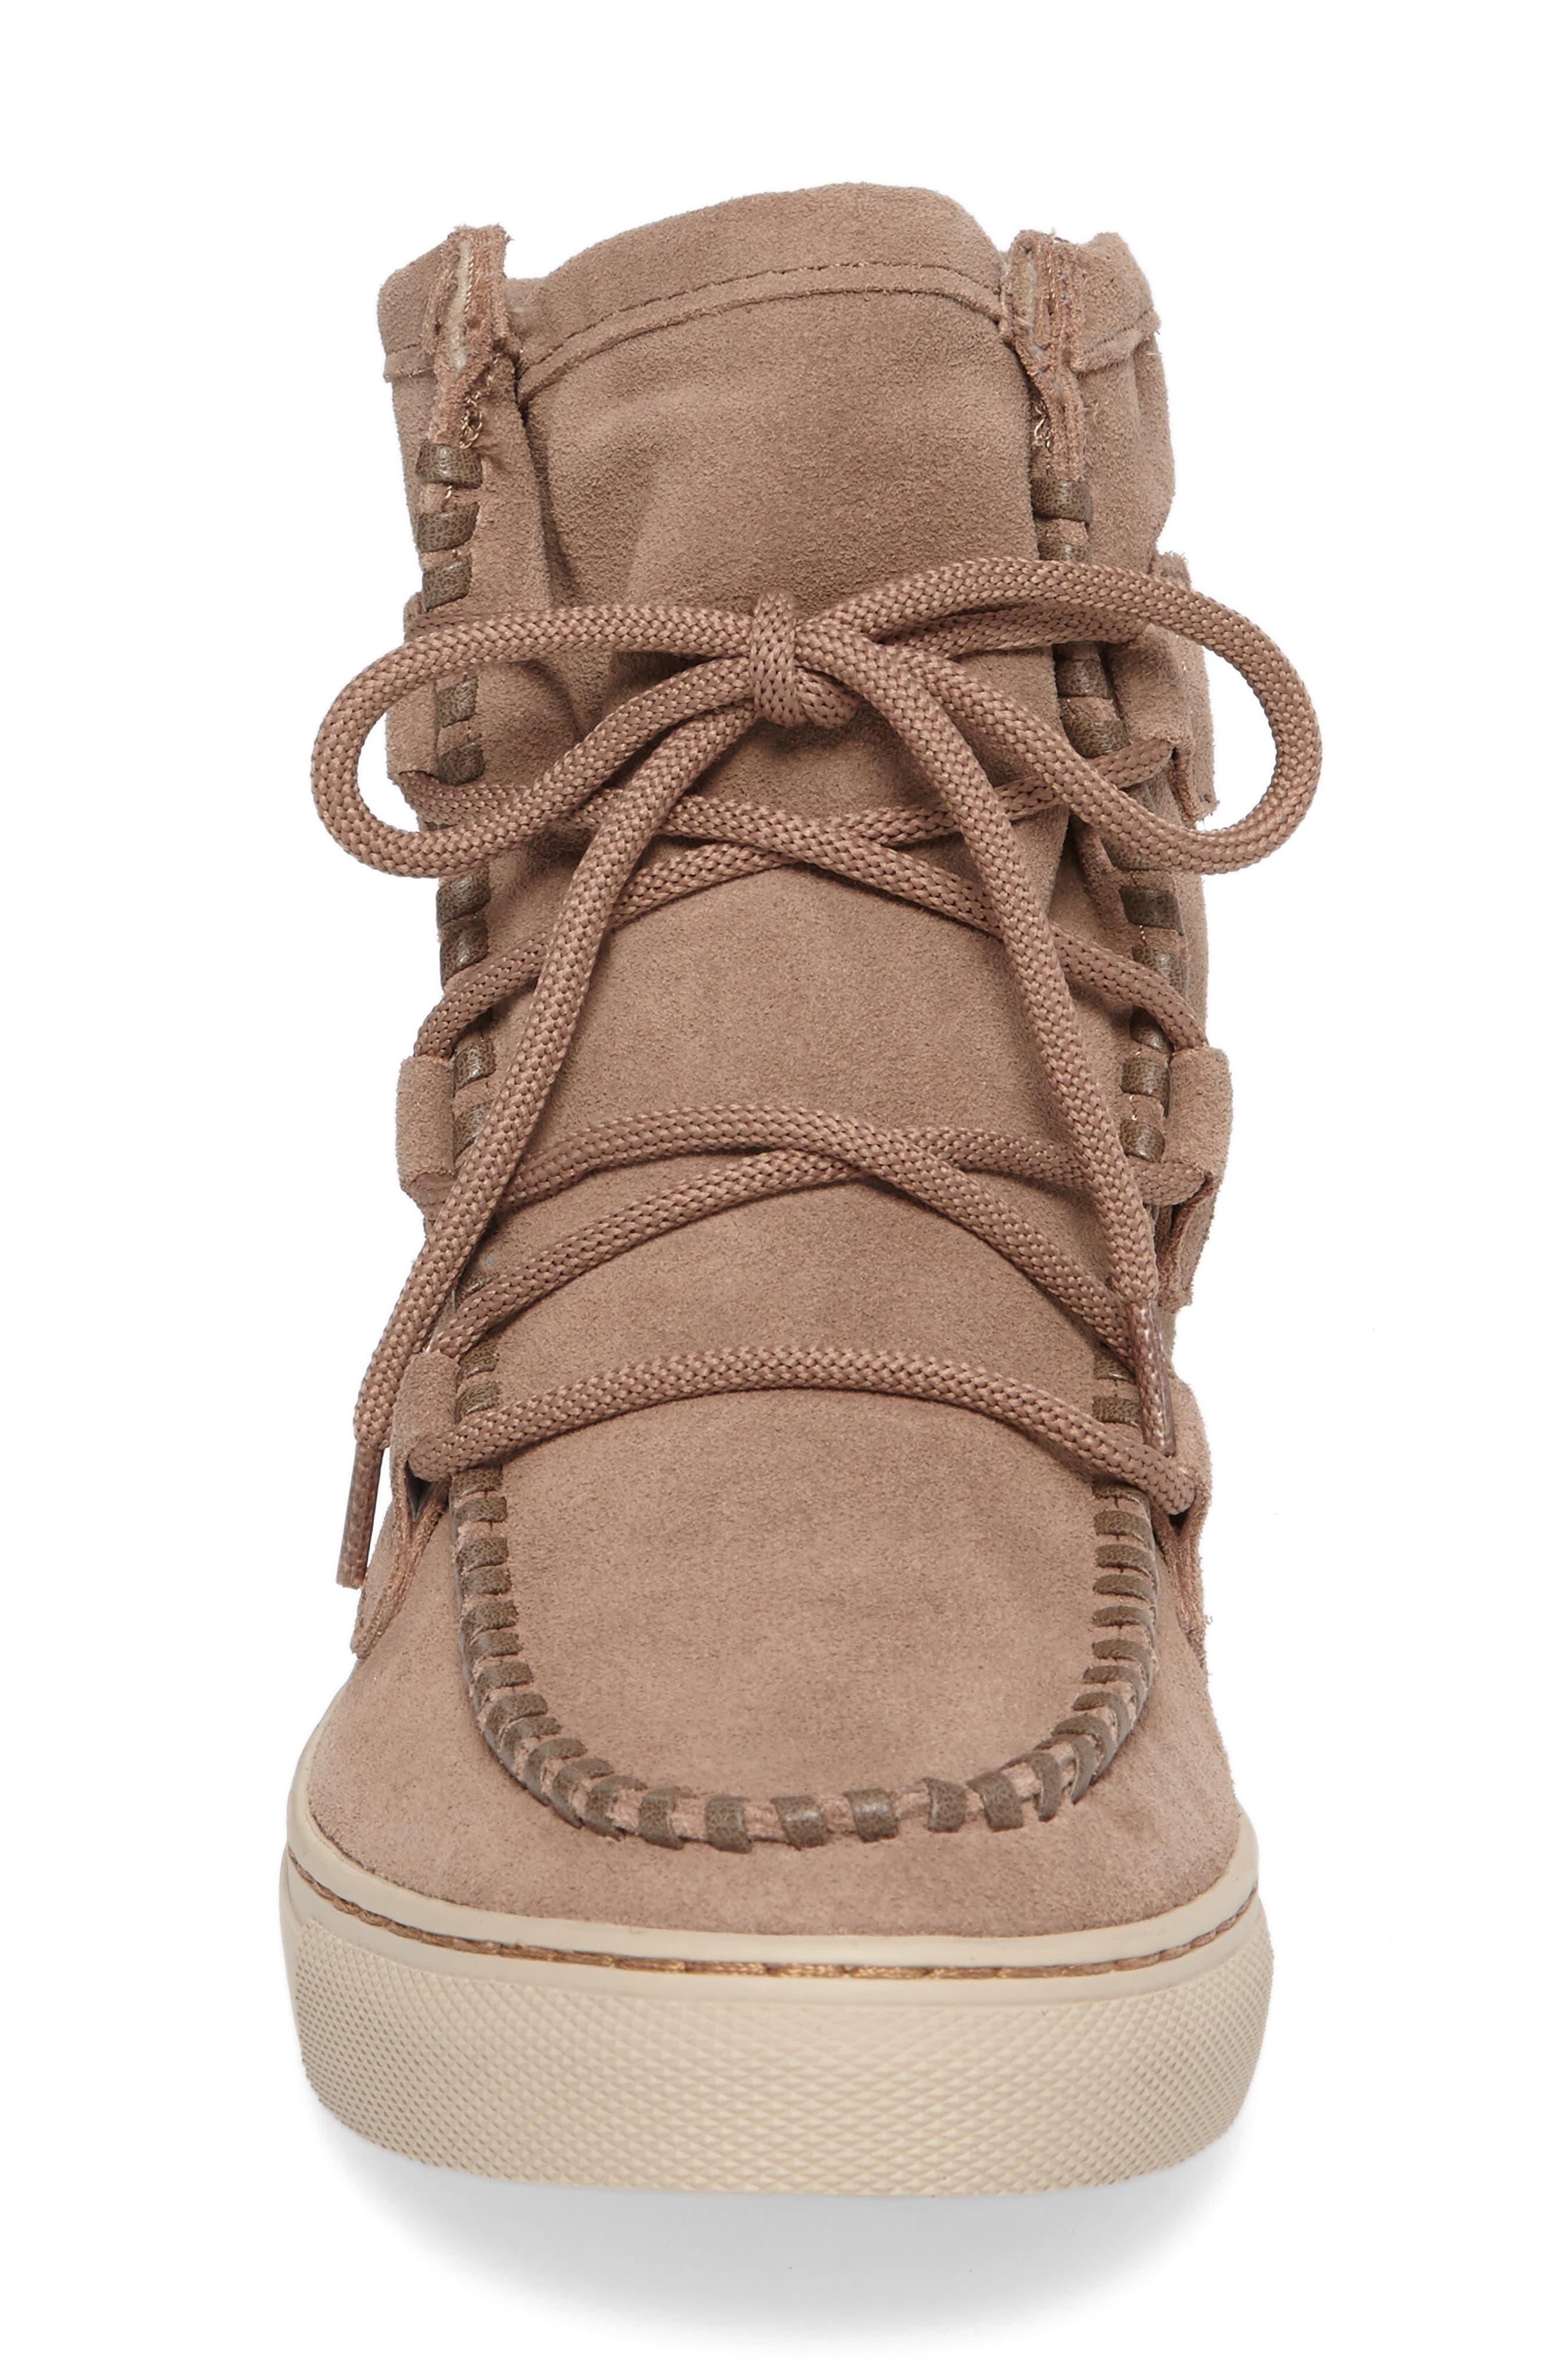 Fabiola Waterproof High Top Sneaker,                             Alternate thumbnail 4, color,                             Taupe Suede